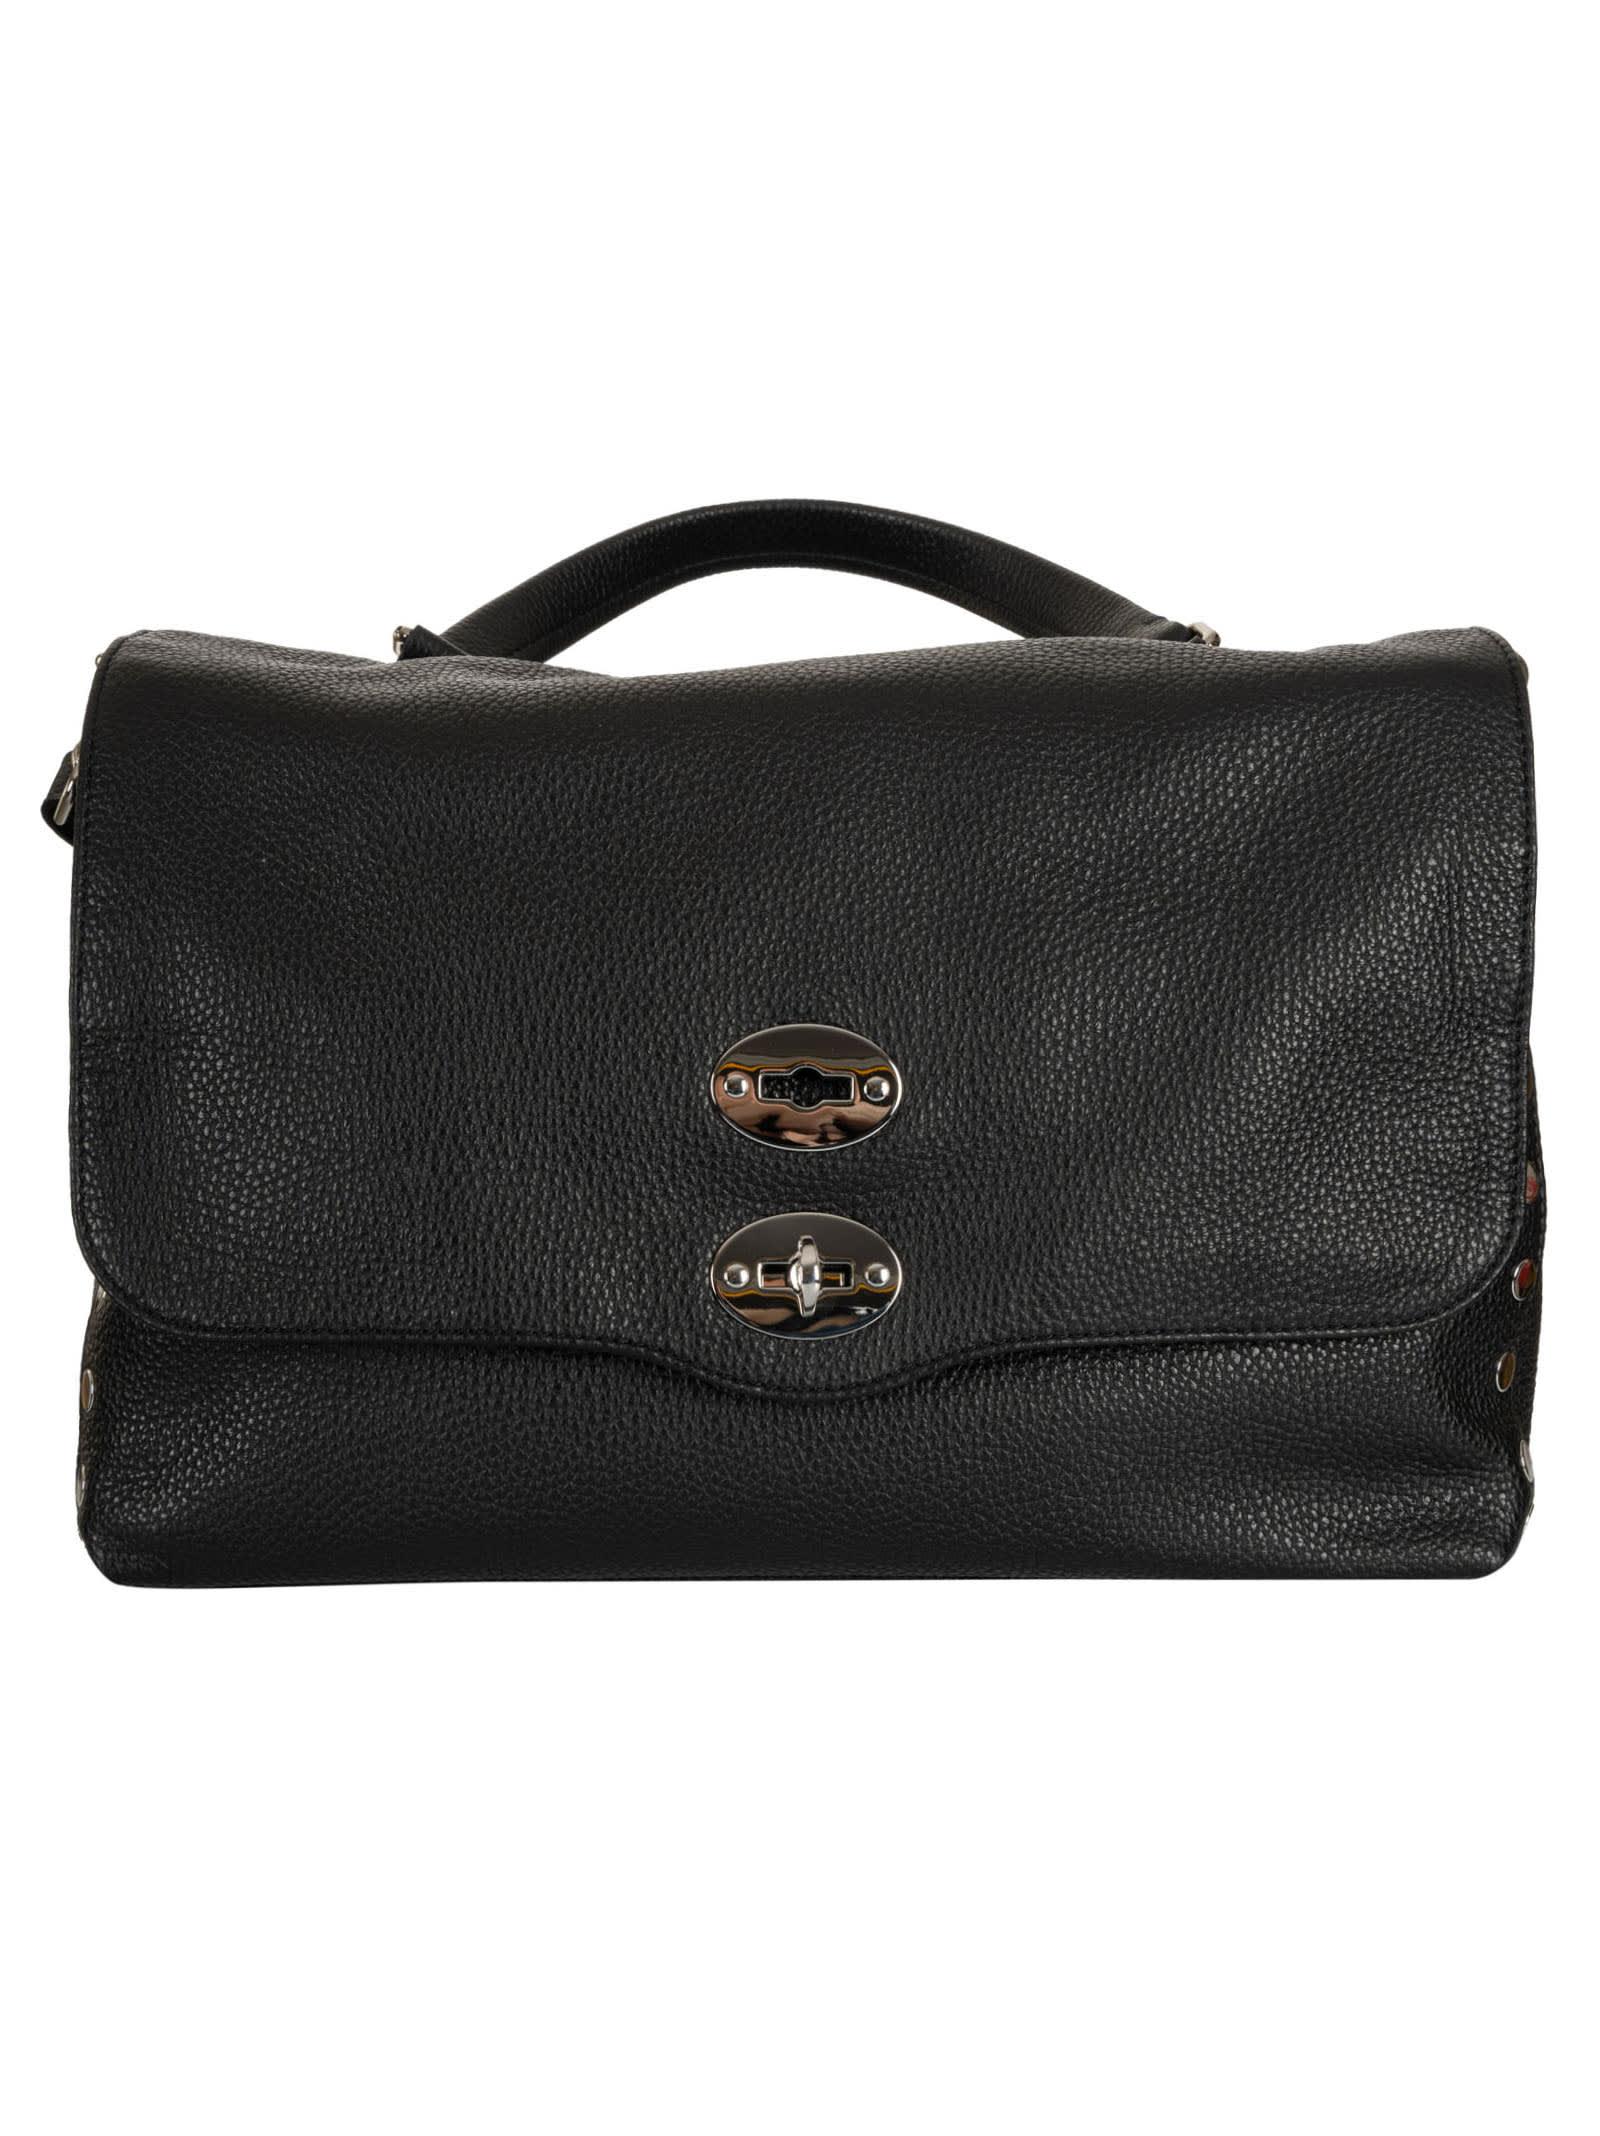 Zanellato Shoulder bags MEDIUM POSTINA SHOULDER BAG